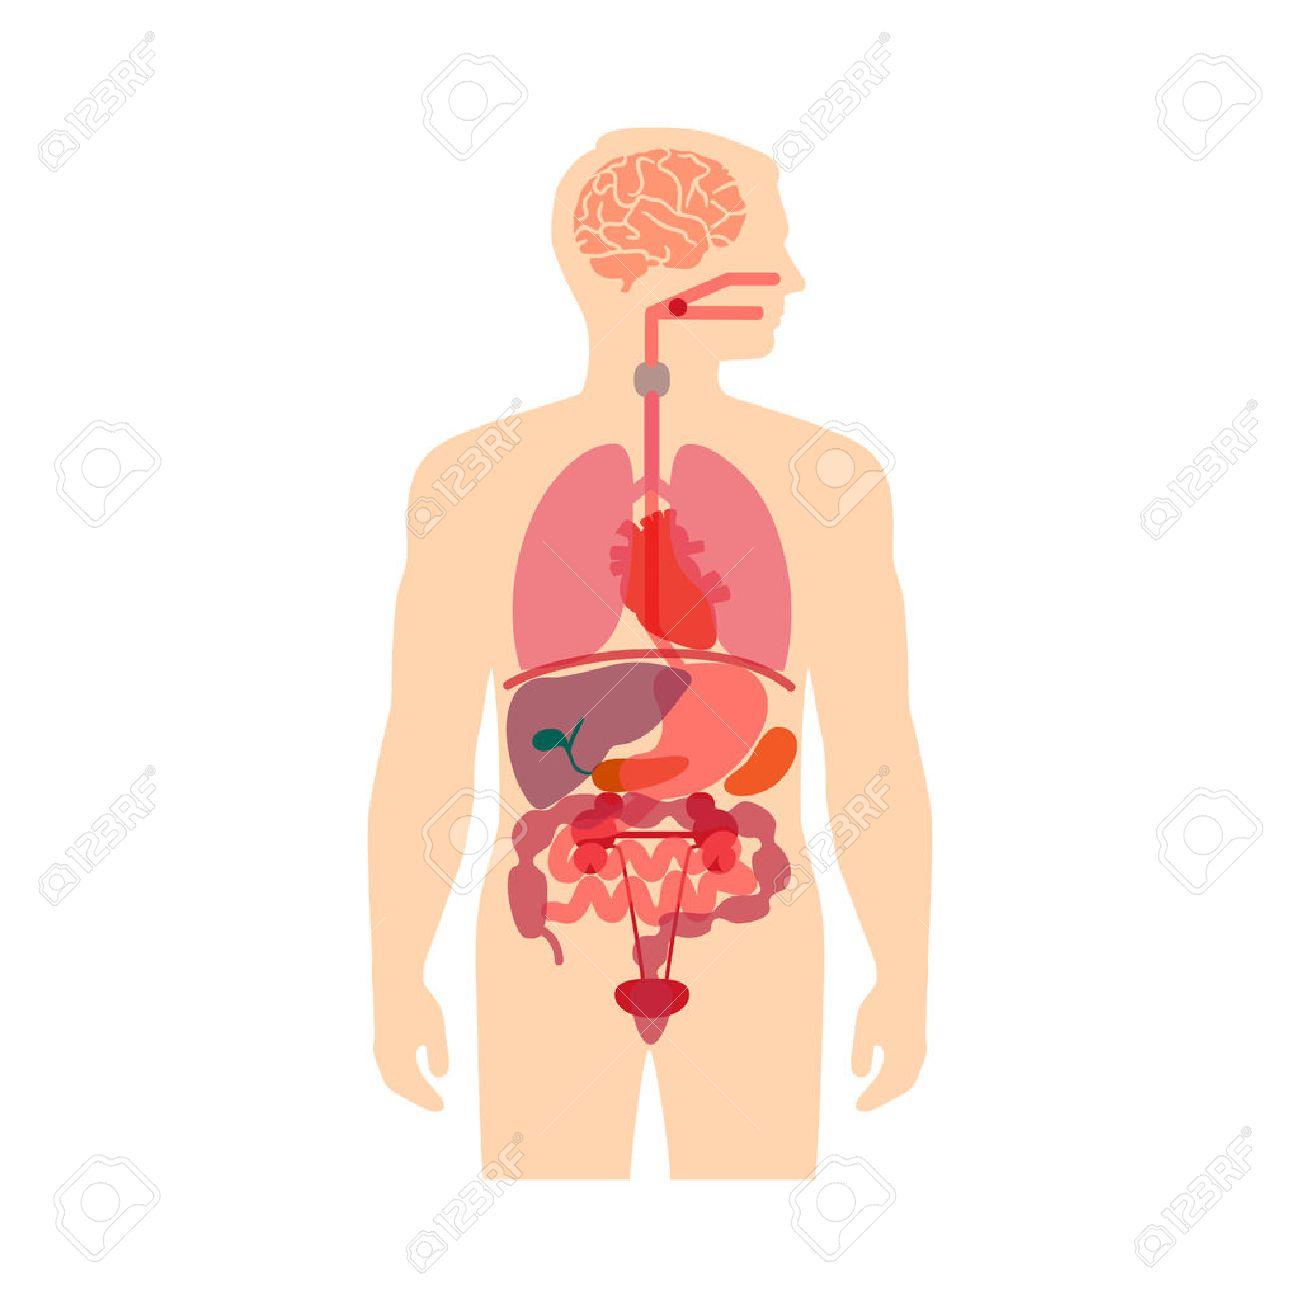 human body anatomy, medical organs vector system, - 39184843